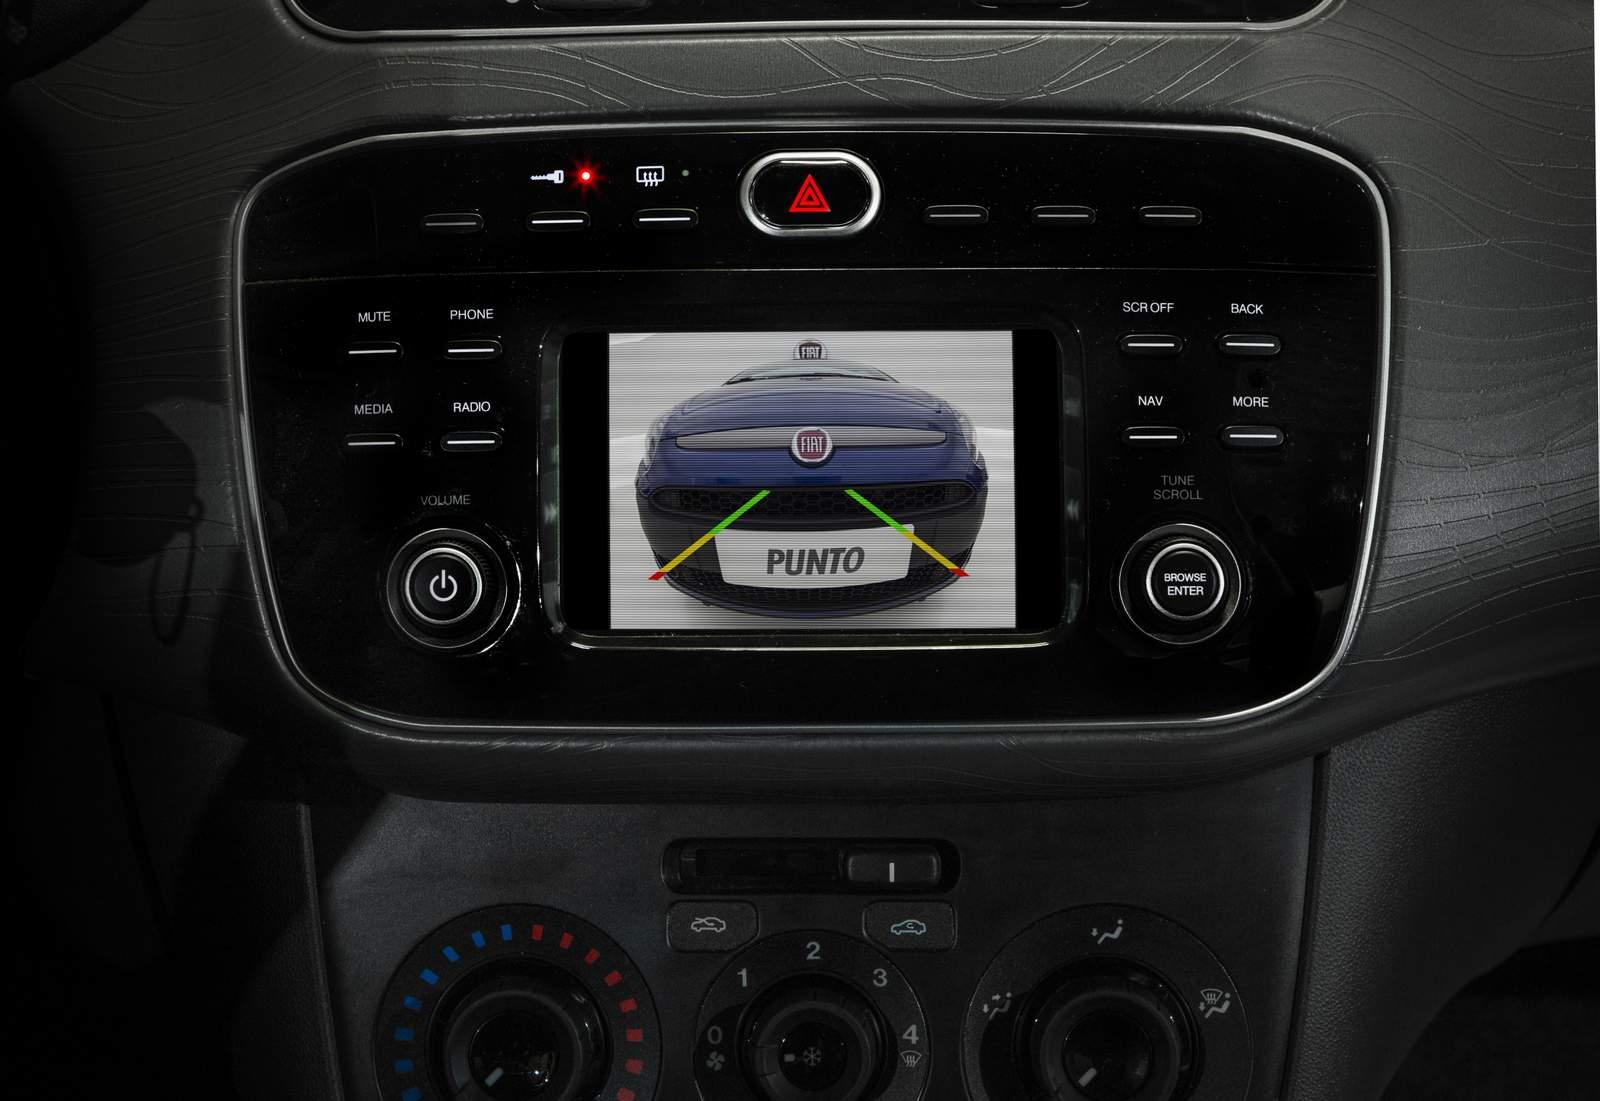 Novo Fiat Punto 2017 - Interior